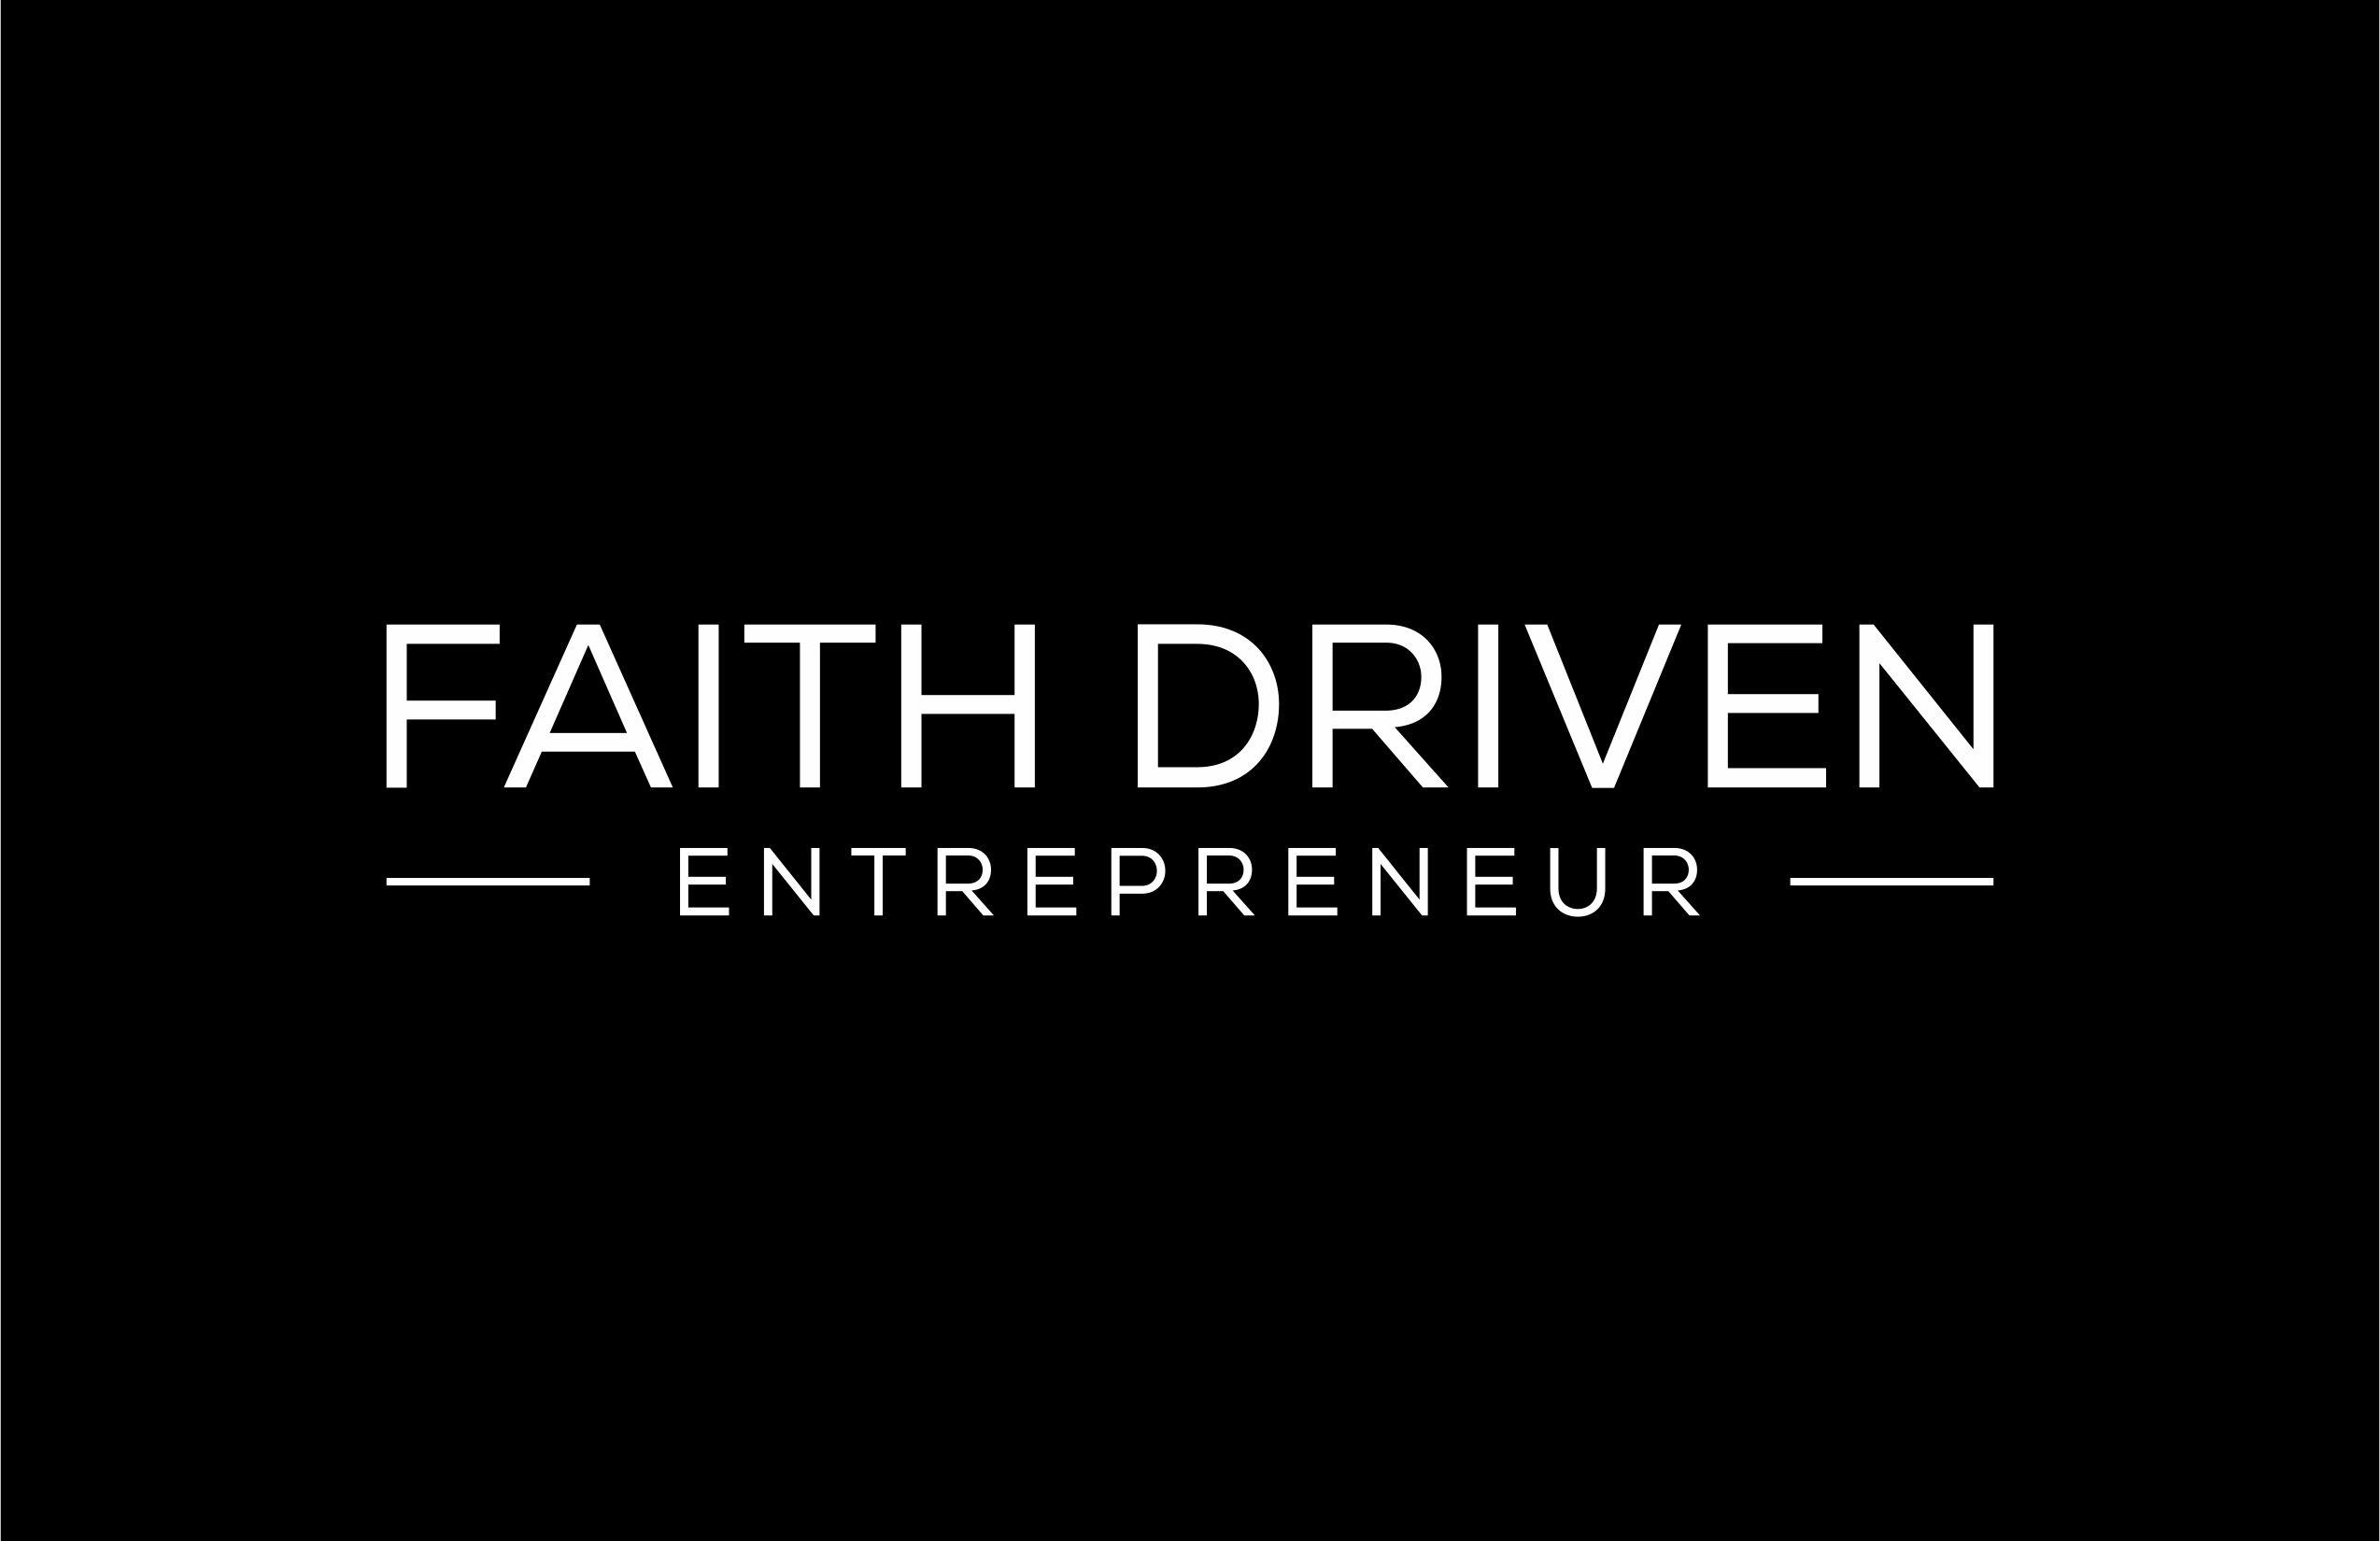 Faith 20driven 20entrepreneur black